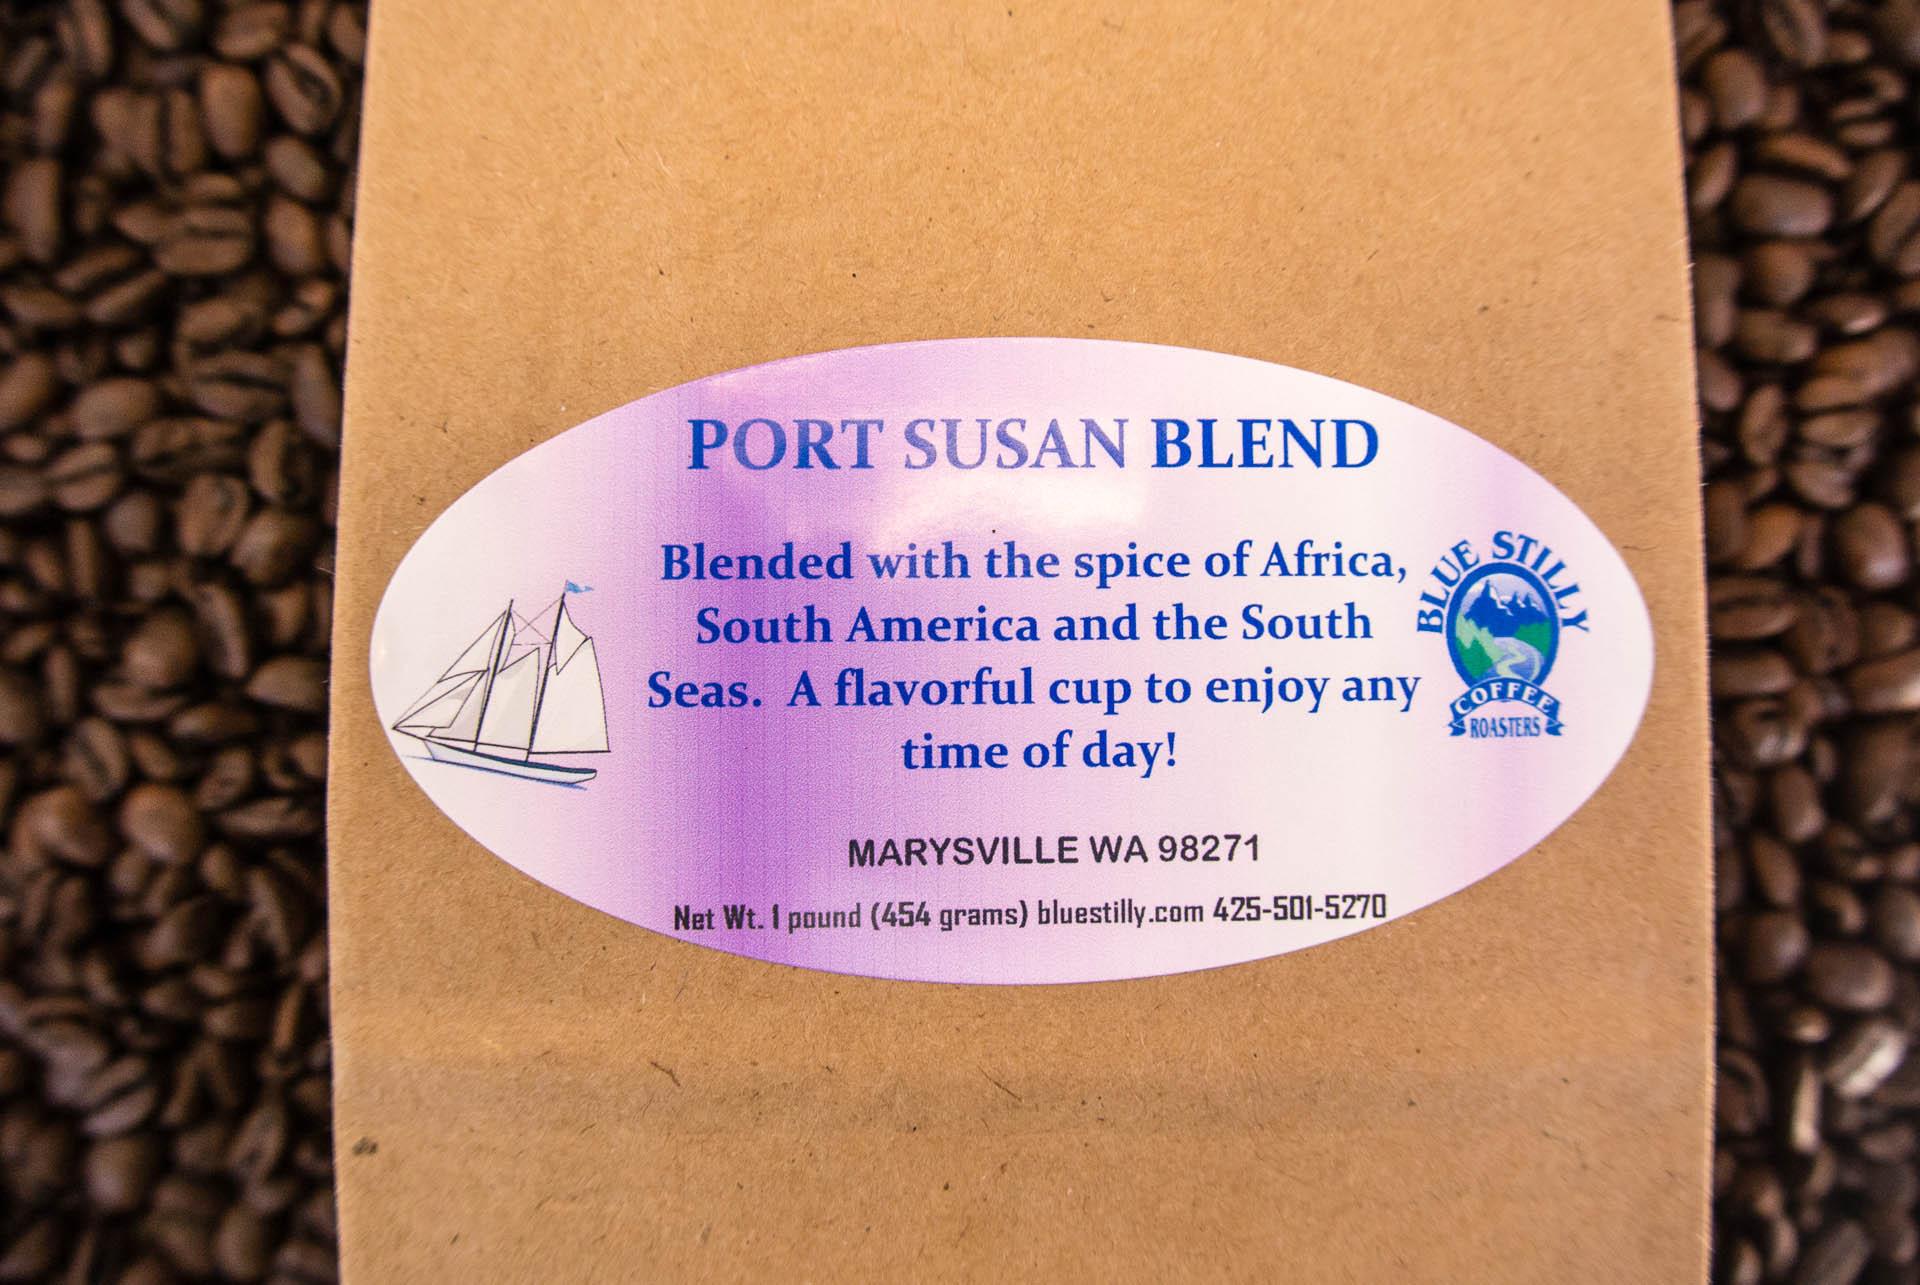 Port Susan Blend